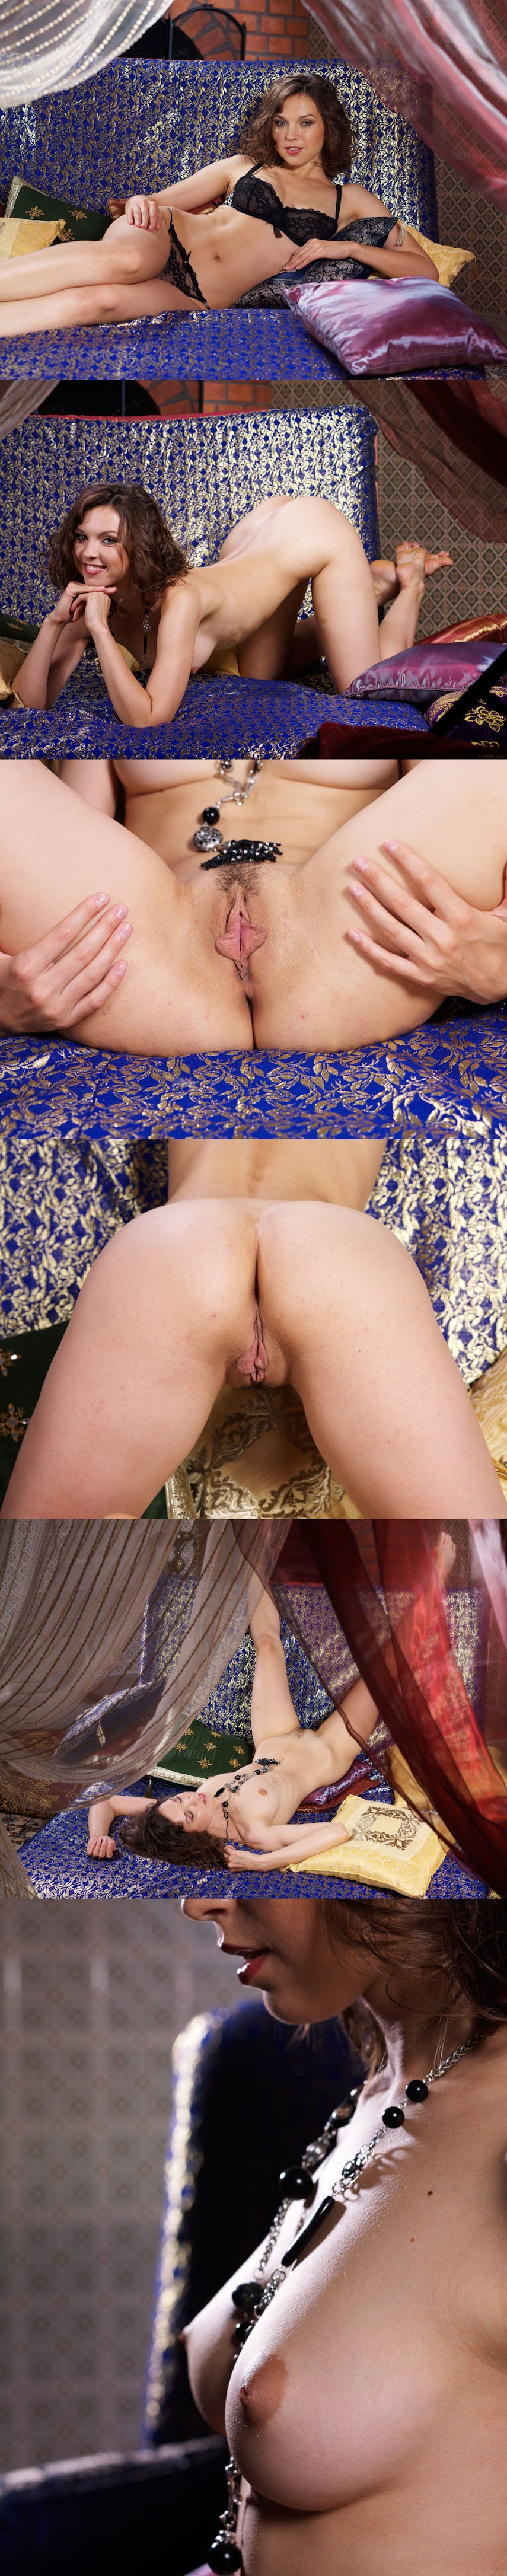 met-art  - 2014-03-01 anita e - finnast  x120  4992x6668 - Girlsdelta